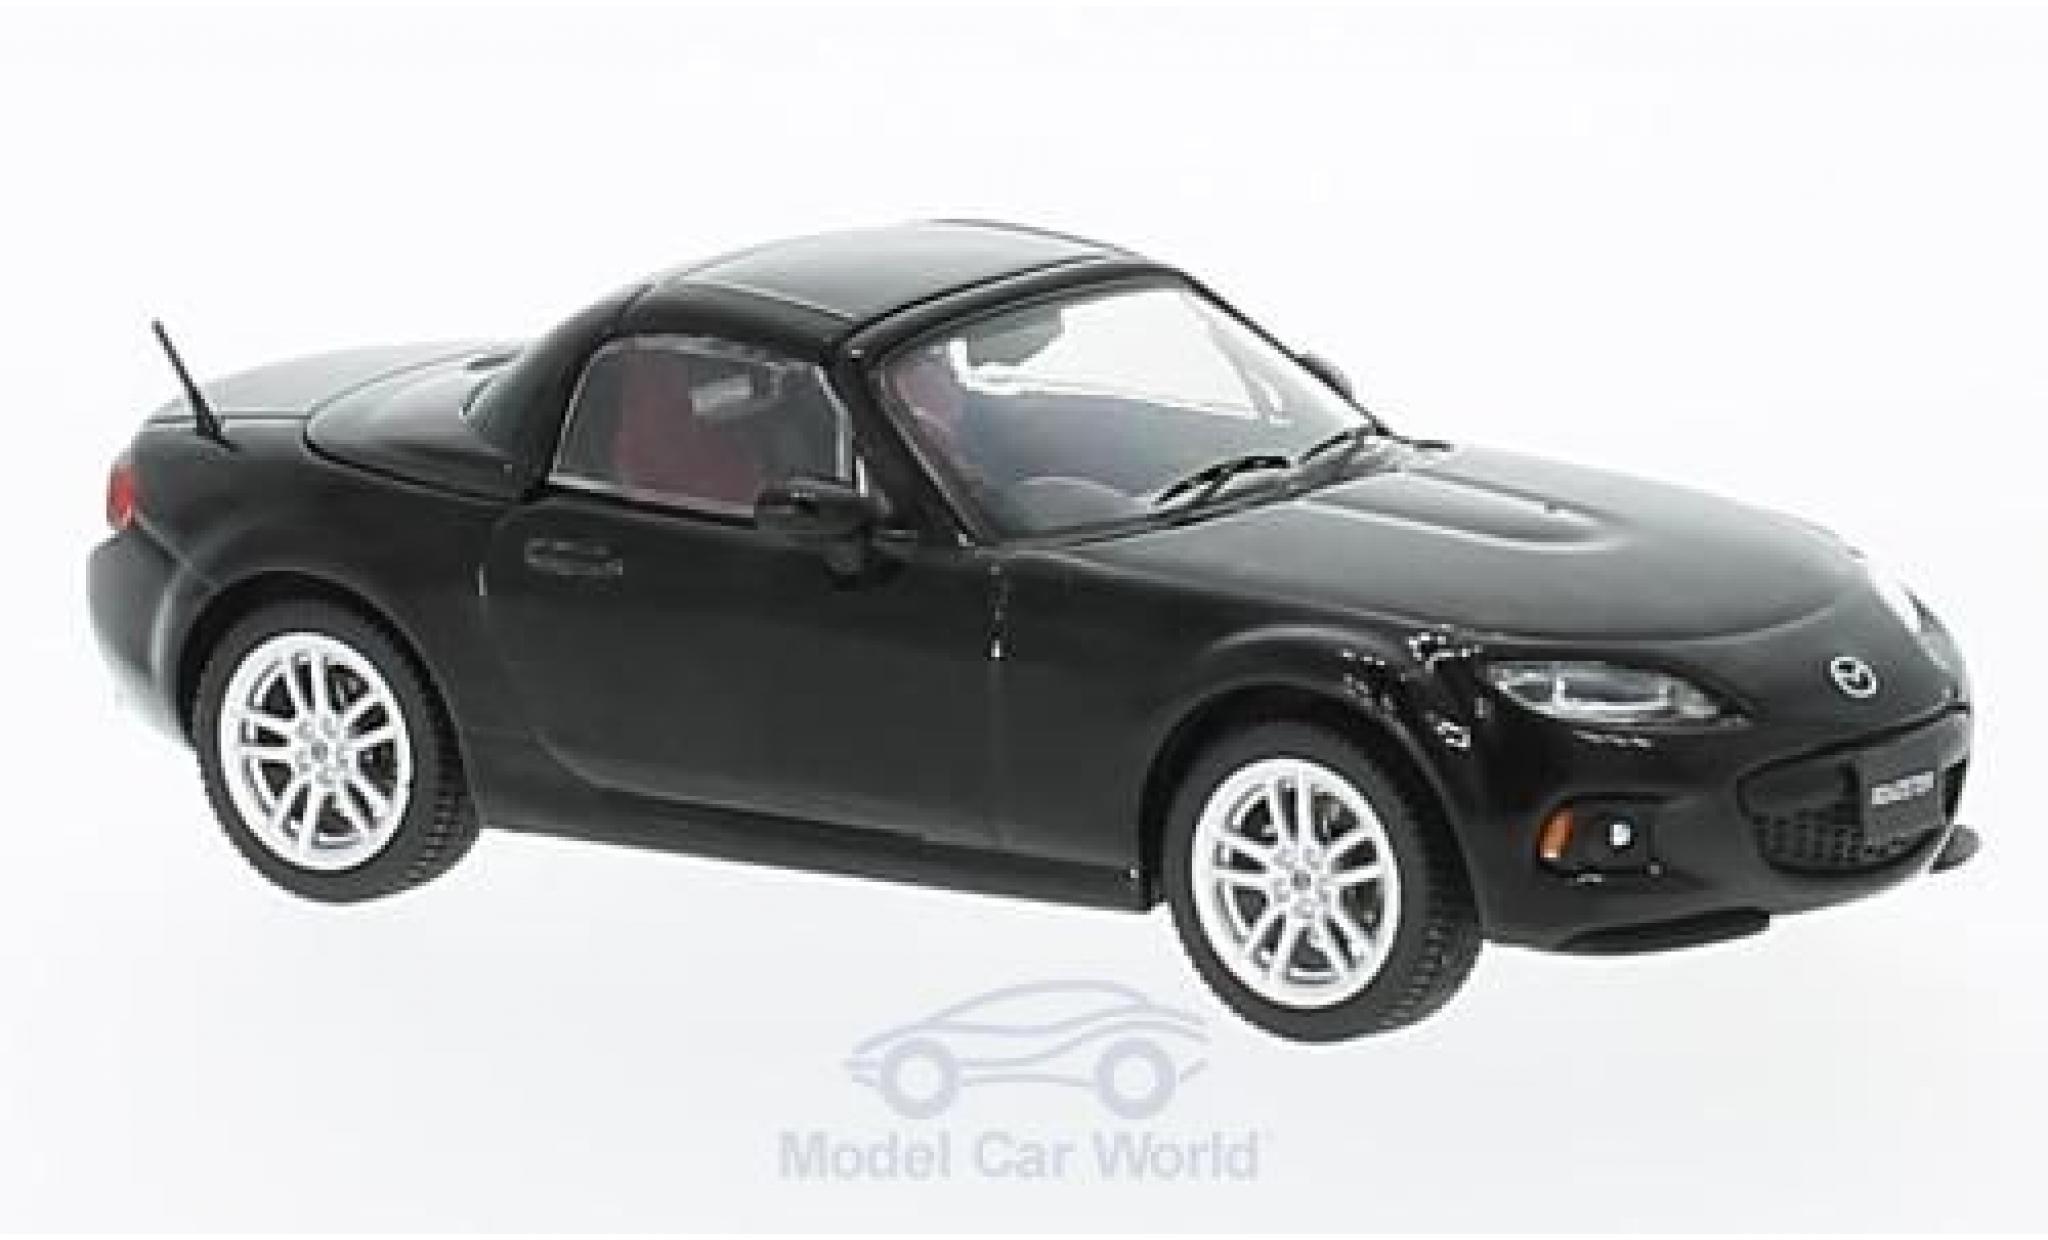 Mazda MX 1/43 First 43 Models -5 Roadster noire RHD 2013